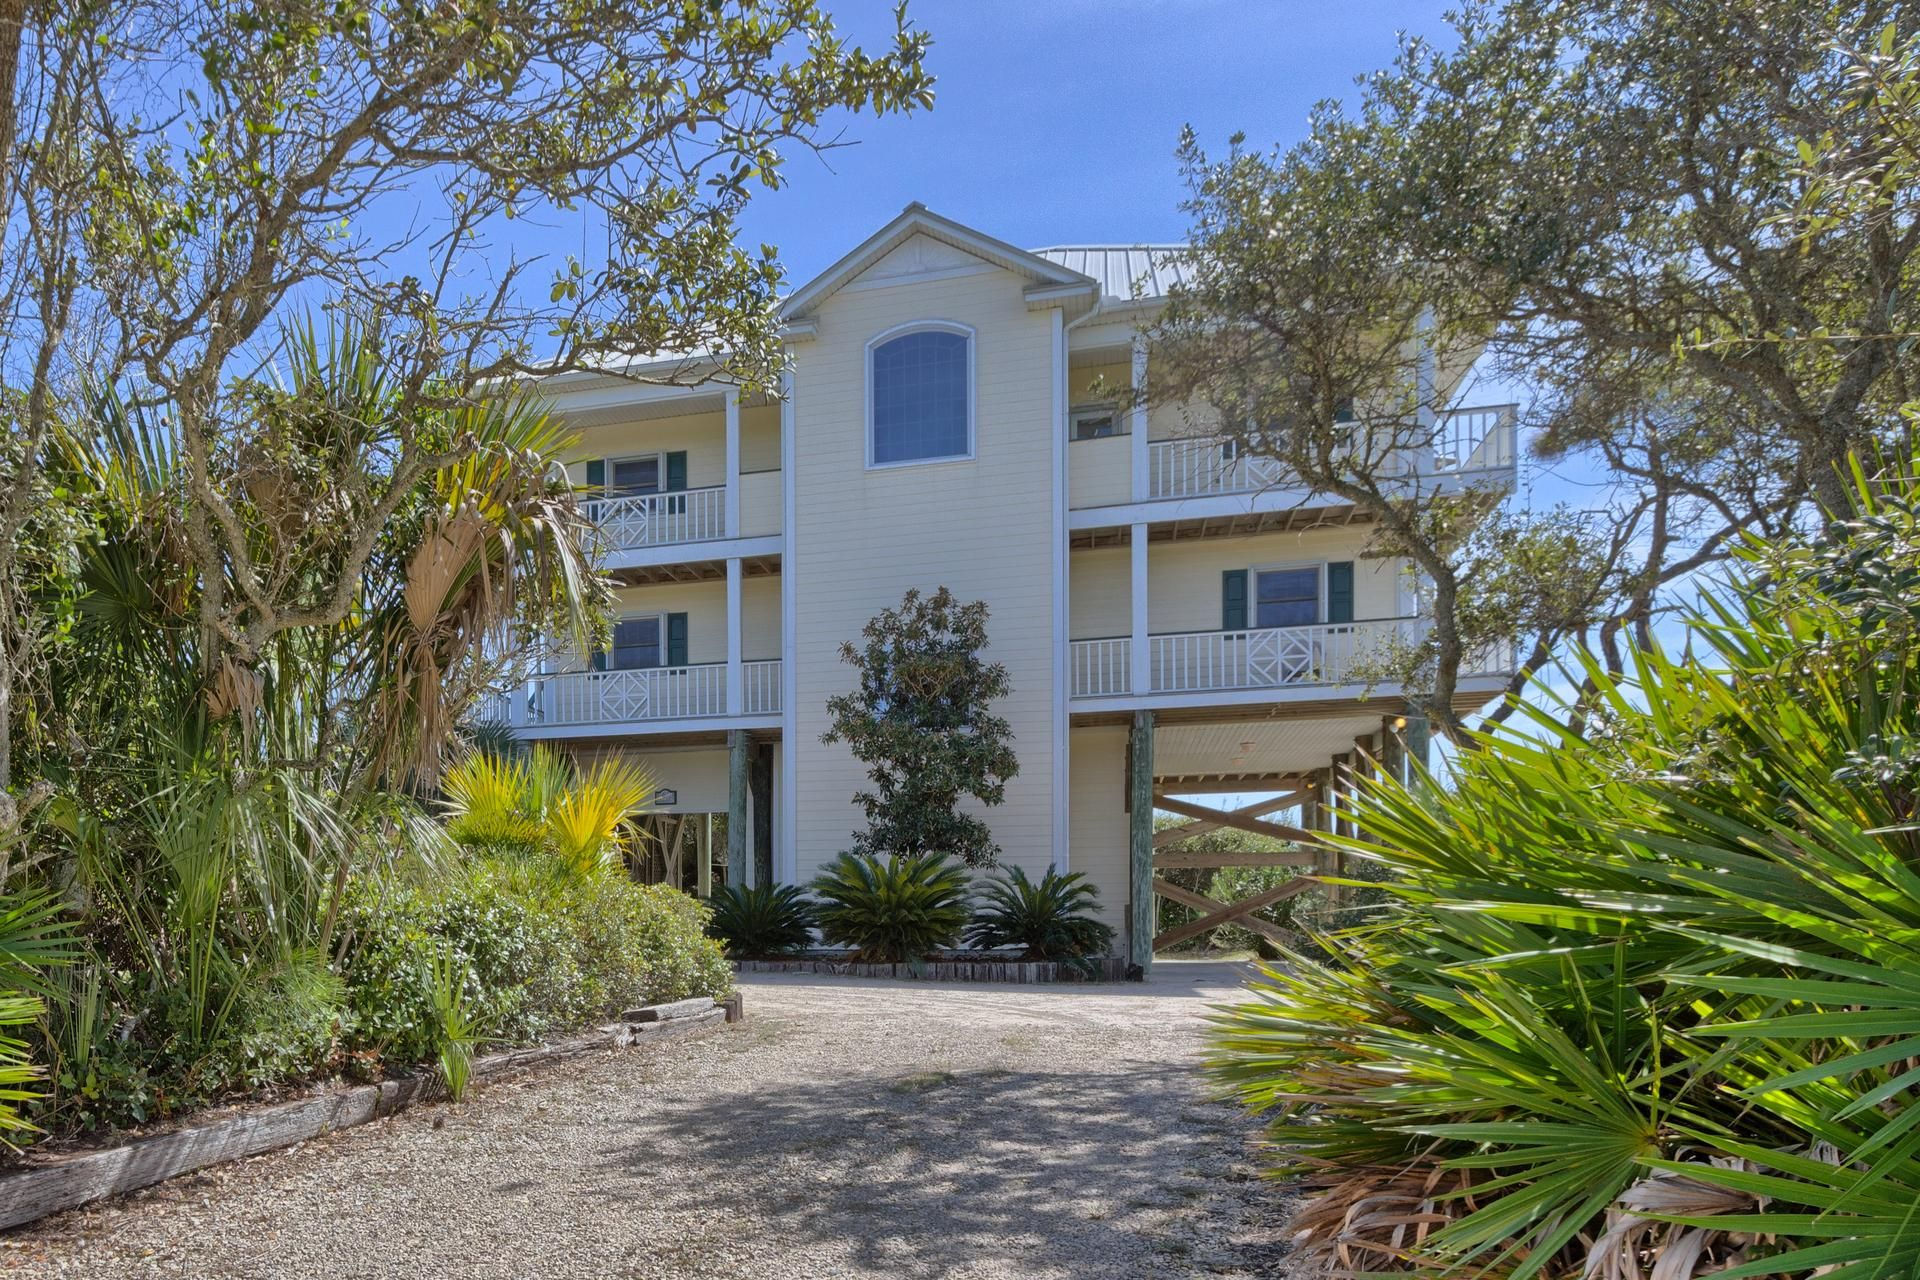 Suncoast Vacation Rentals St. Island, Florida